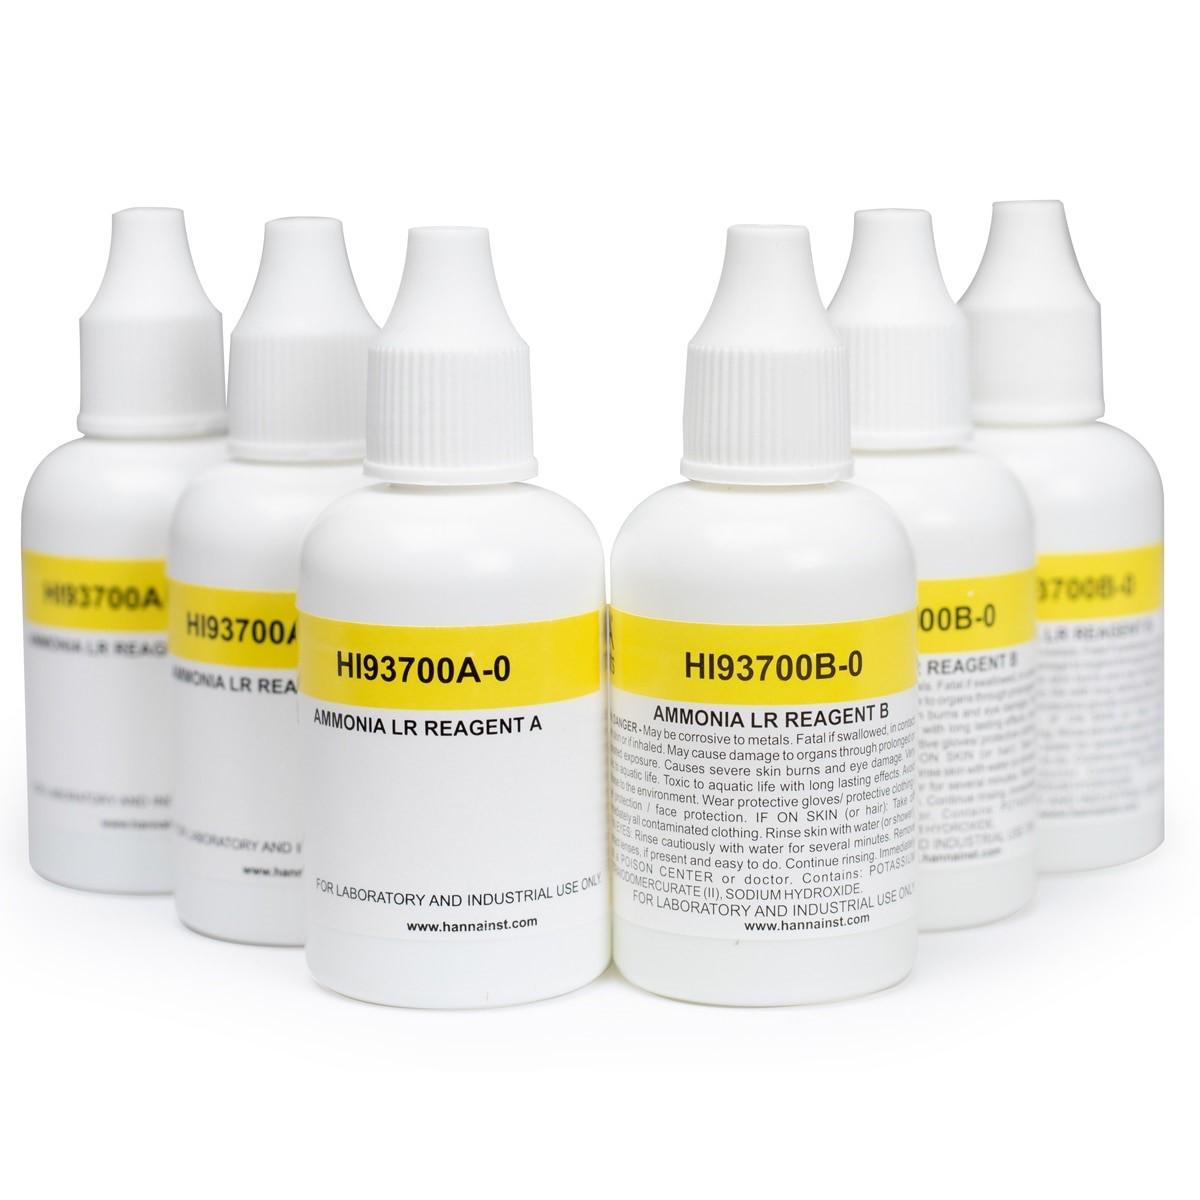 HI93700-03 Ammonia LR Colorimetric Reagents (300 tests)